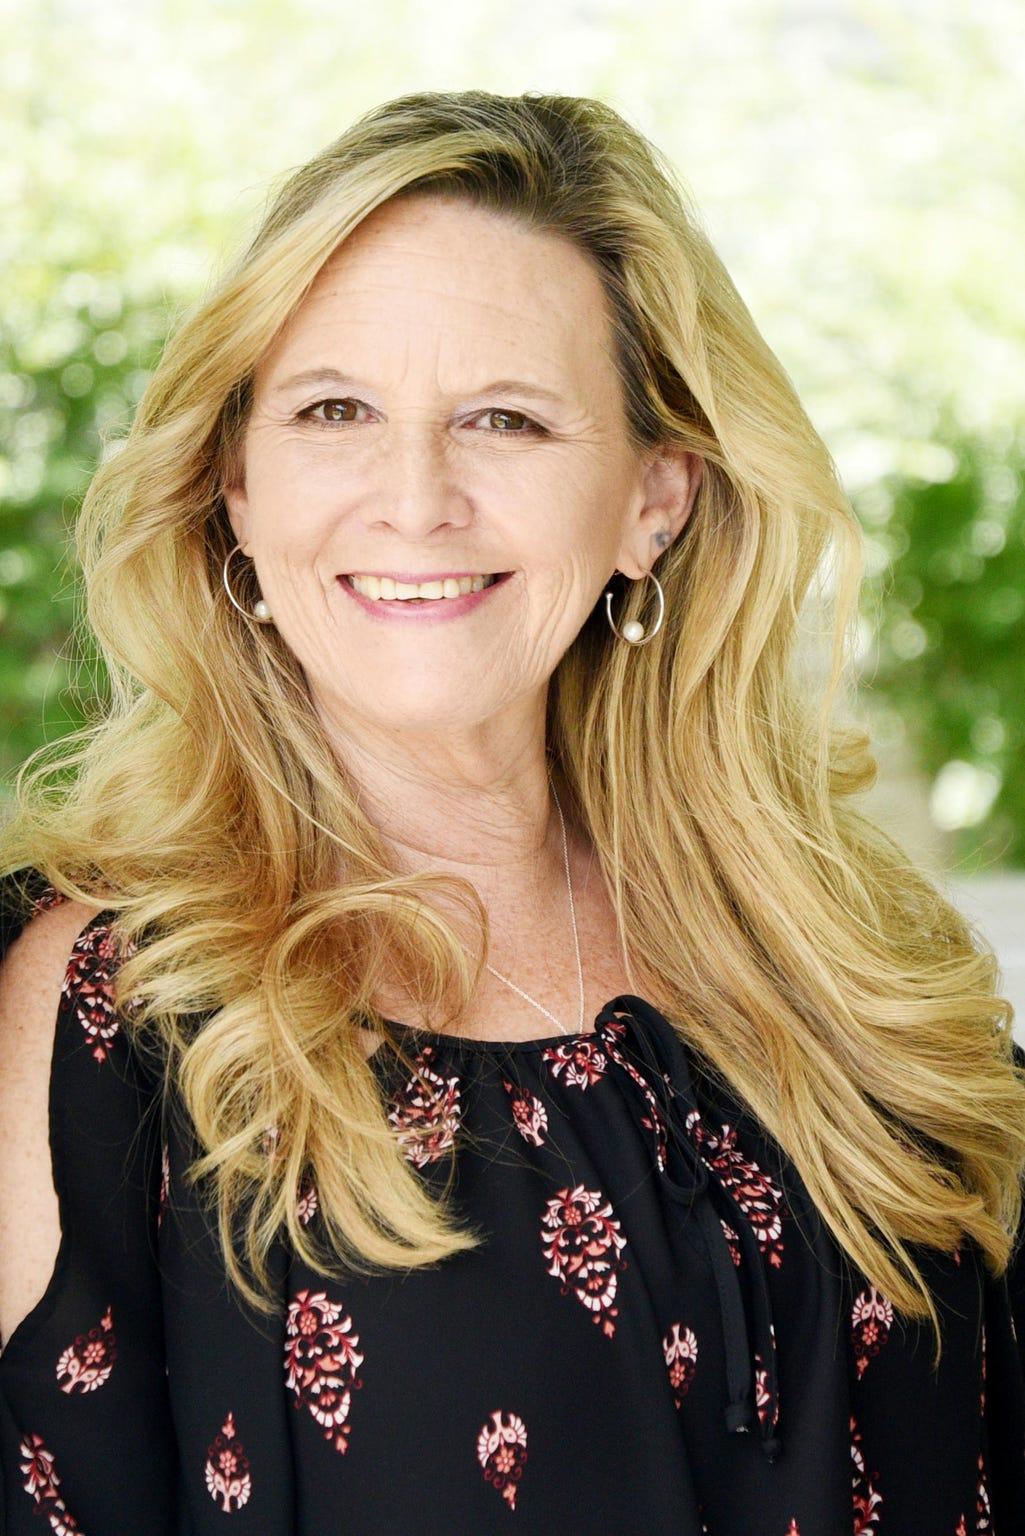 Gina Hartley was Oakwood's director from 2017-2019.